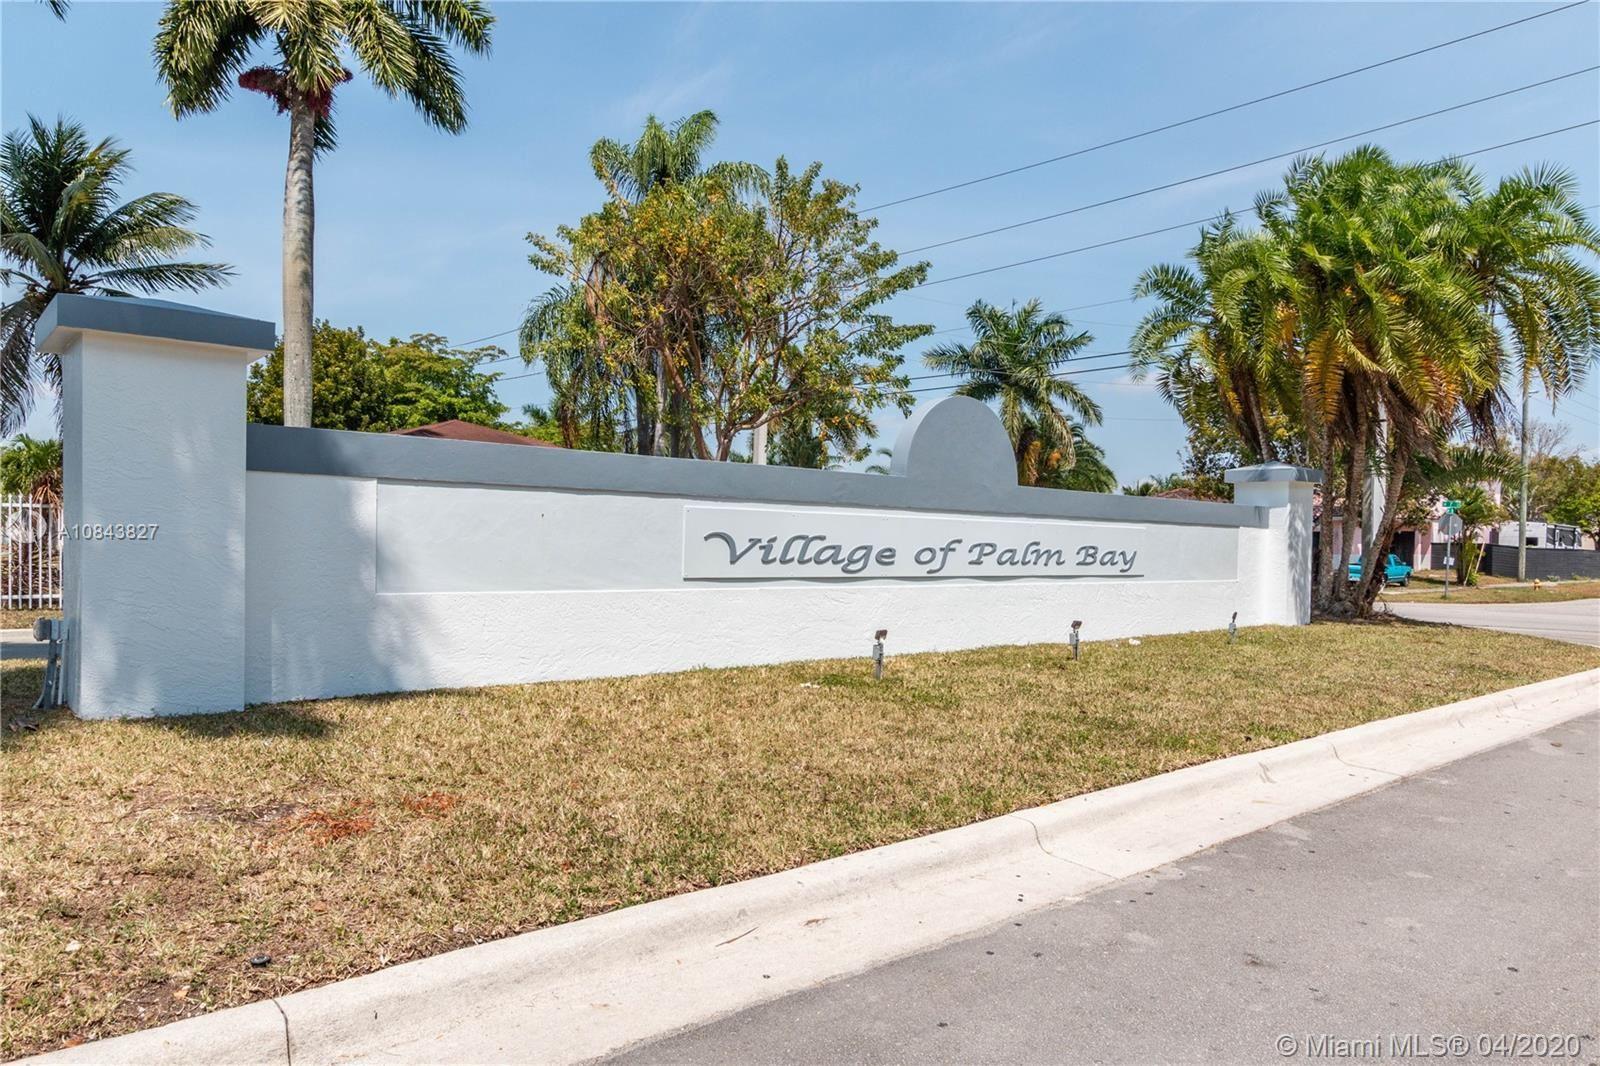 847 SW 7th Plz, Florida City, FL 33034 - #: A10843827